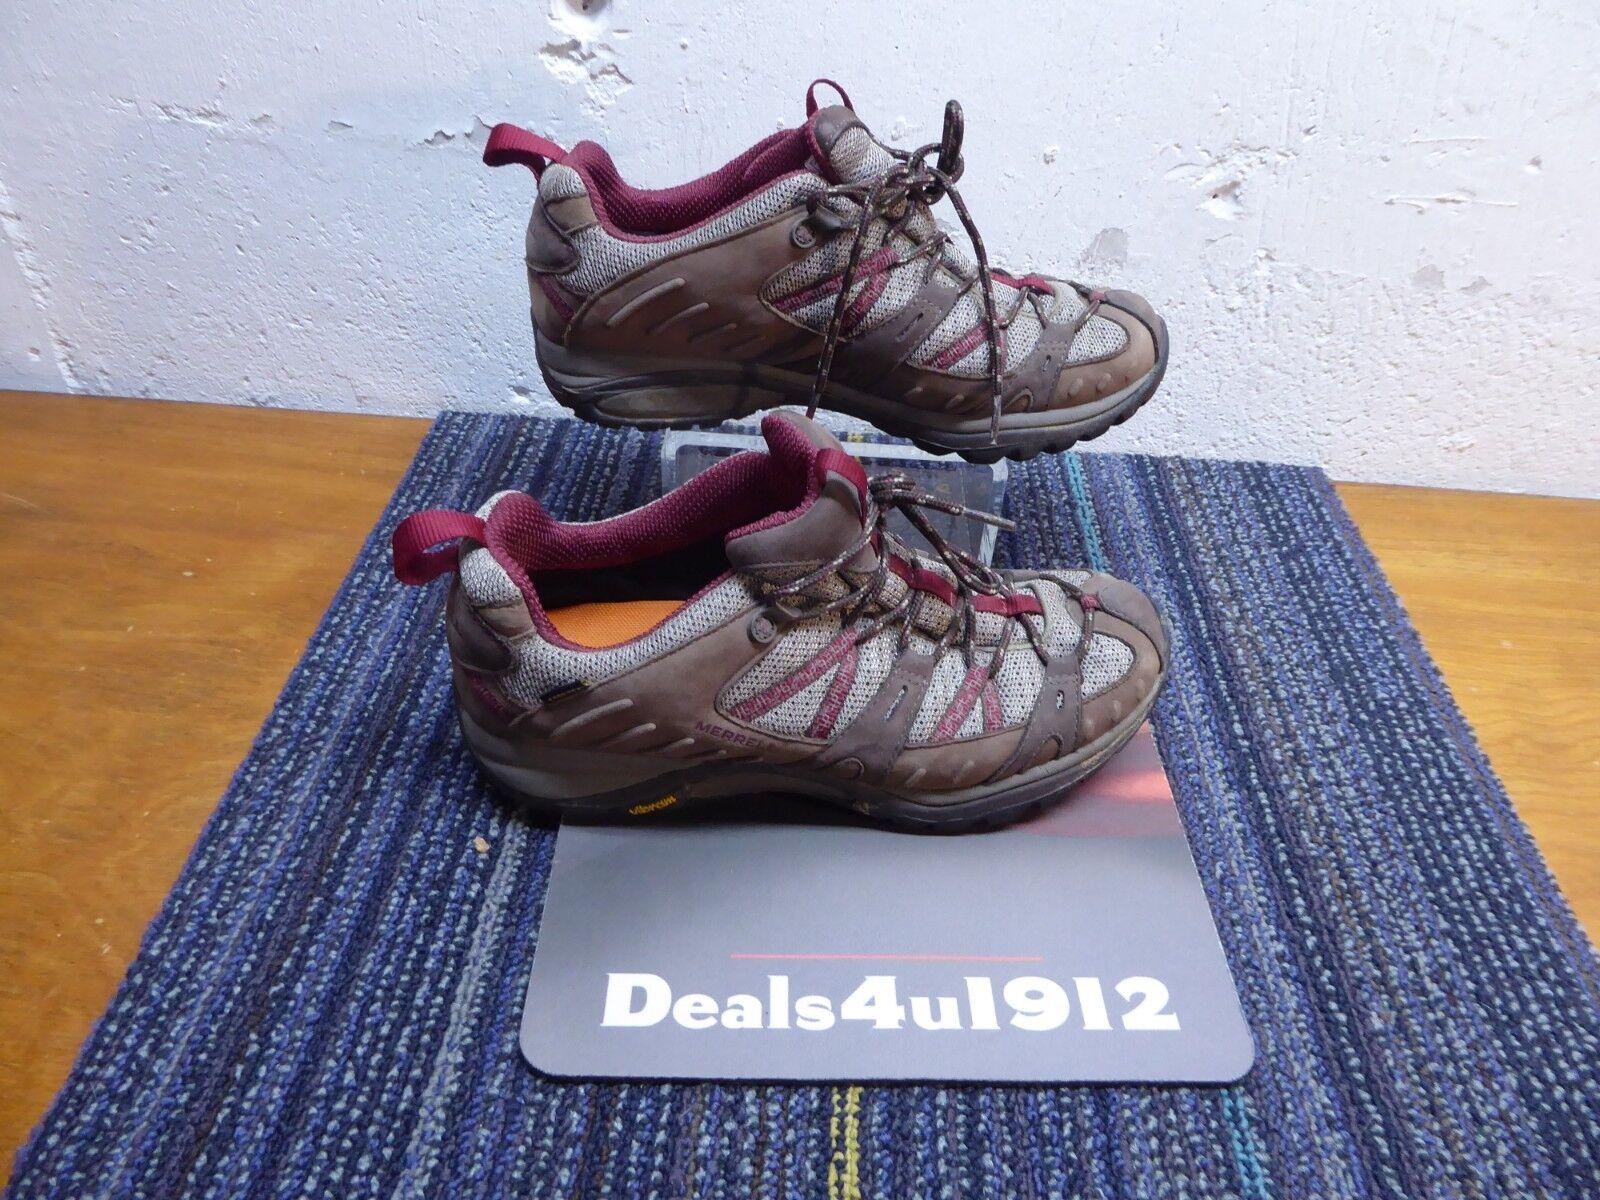 Merrell Siren Sport Women's Gore tex Hiking shoes US 9 Brown Leather Waterproof